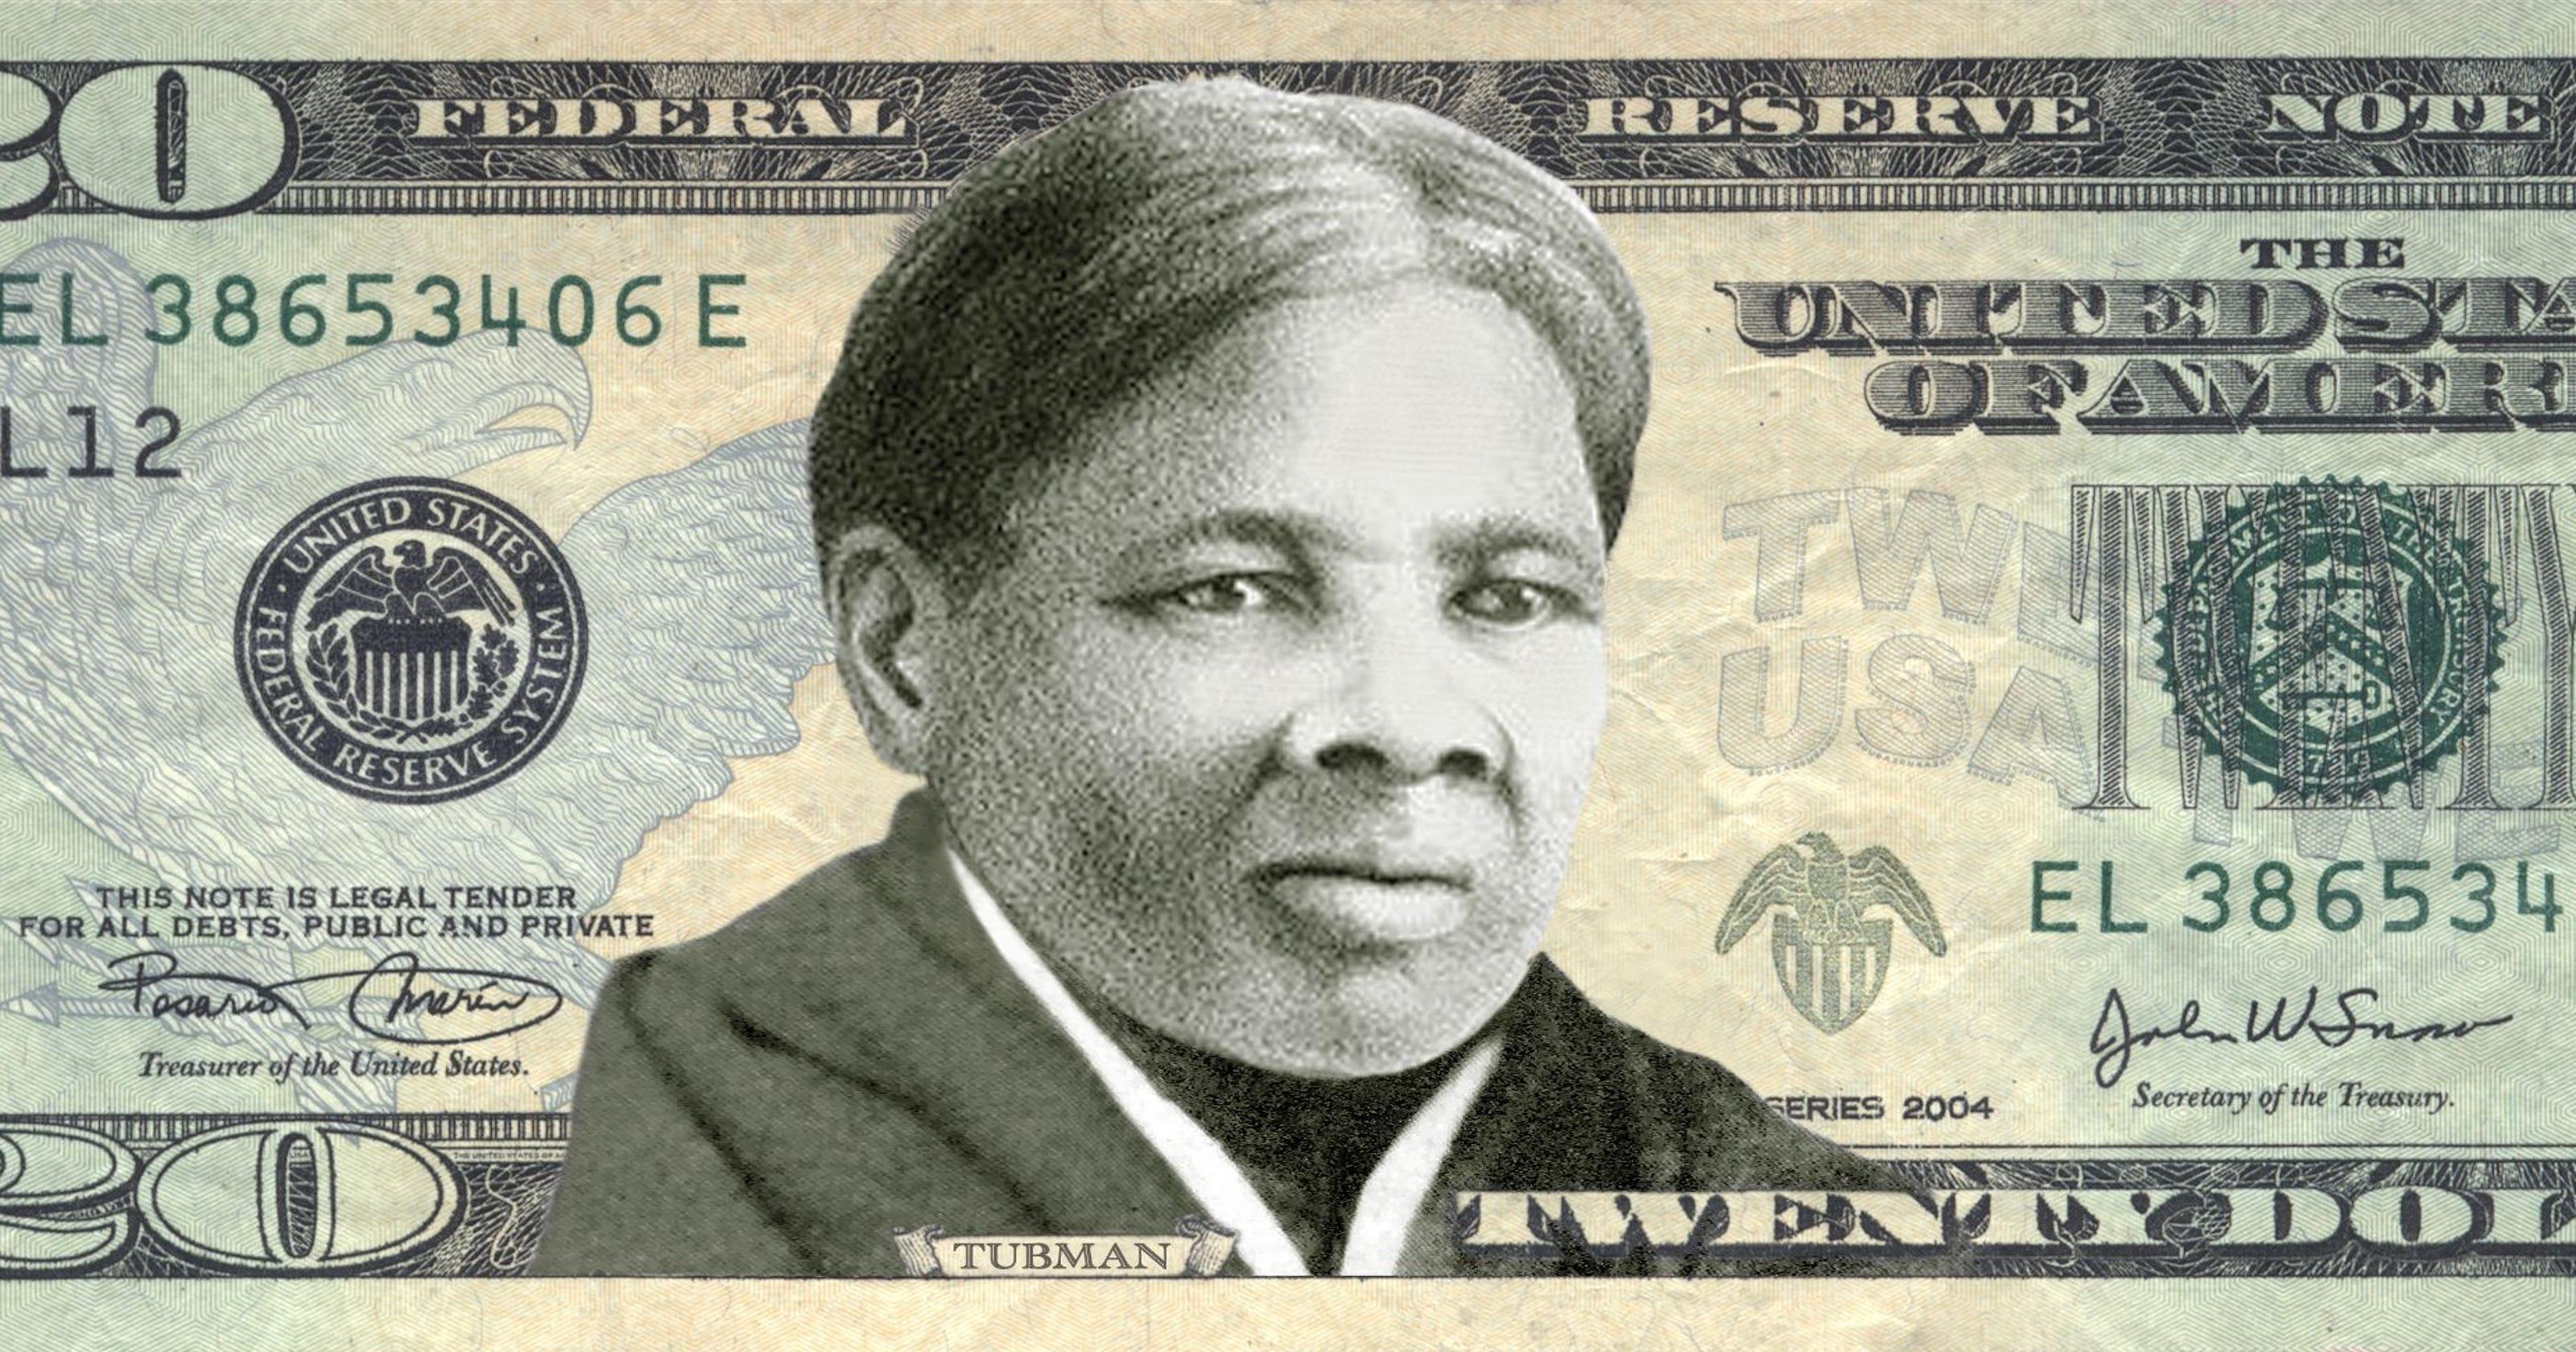 Trump Treasury Secretary says Harriet Tubman $20 bill release delayed 8 years